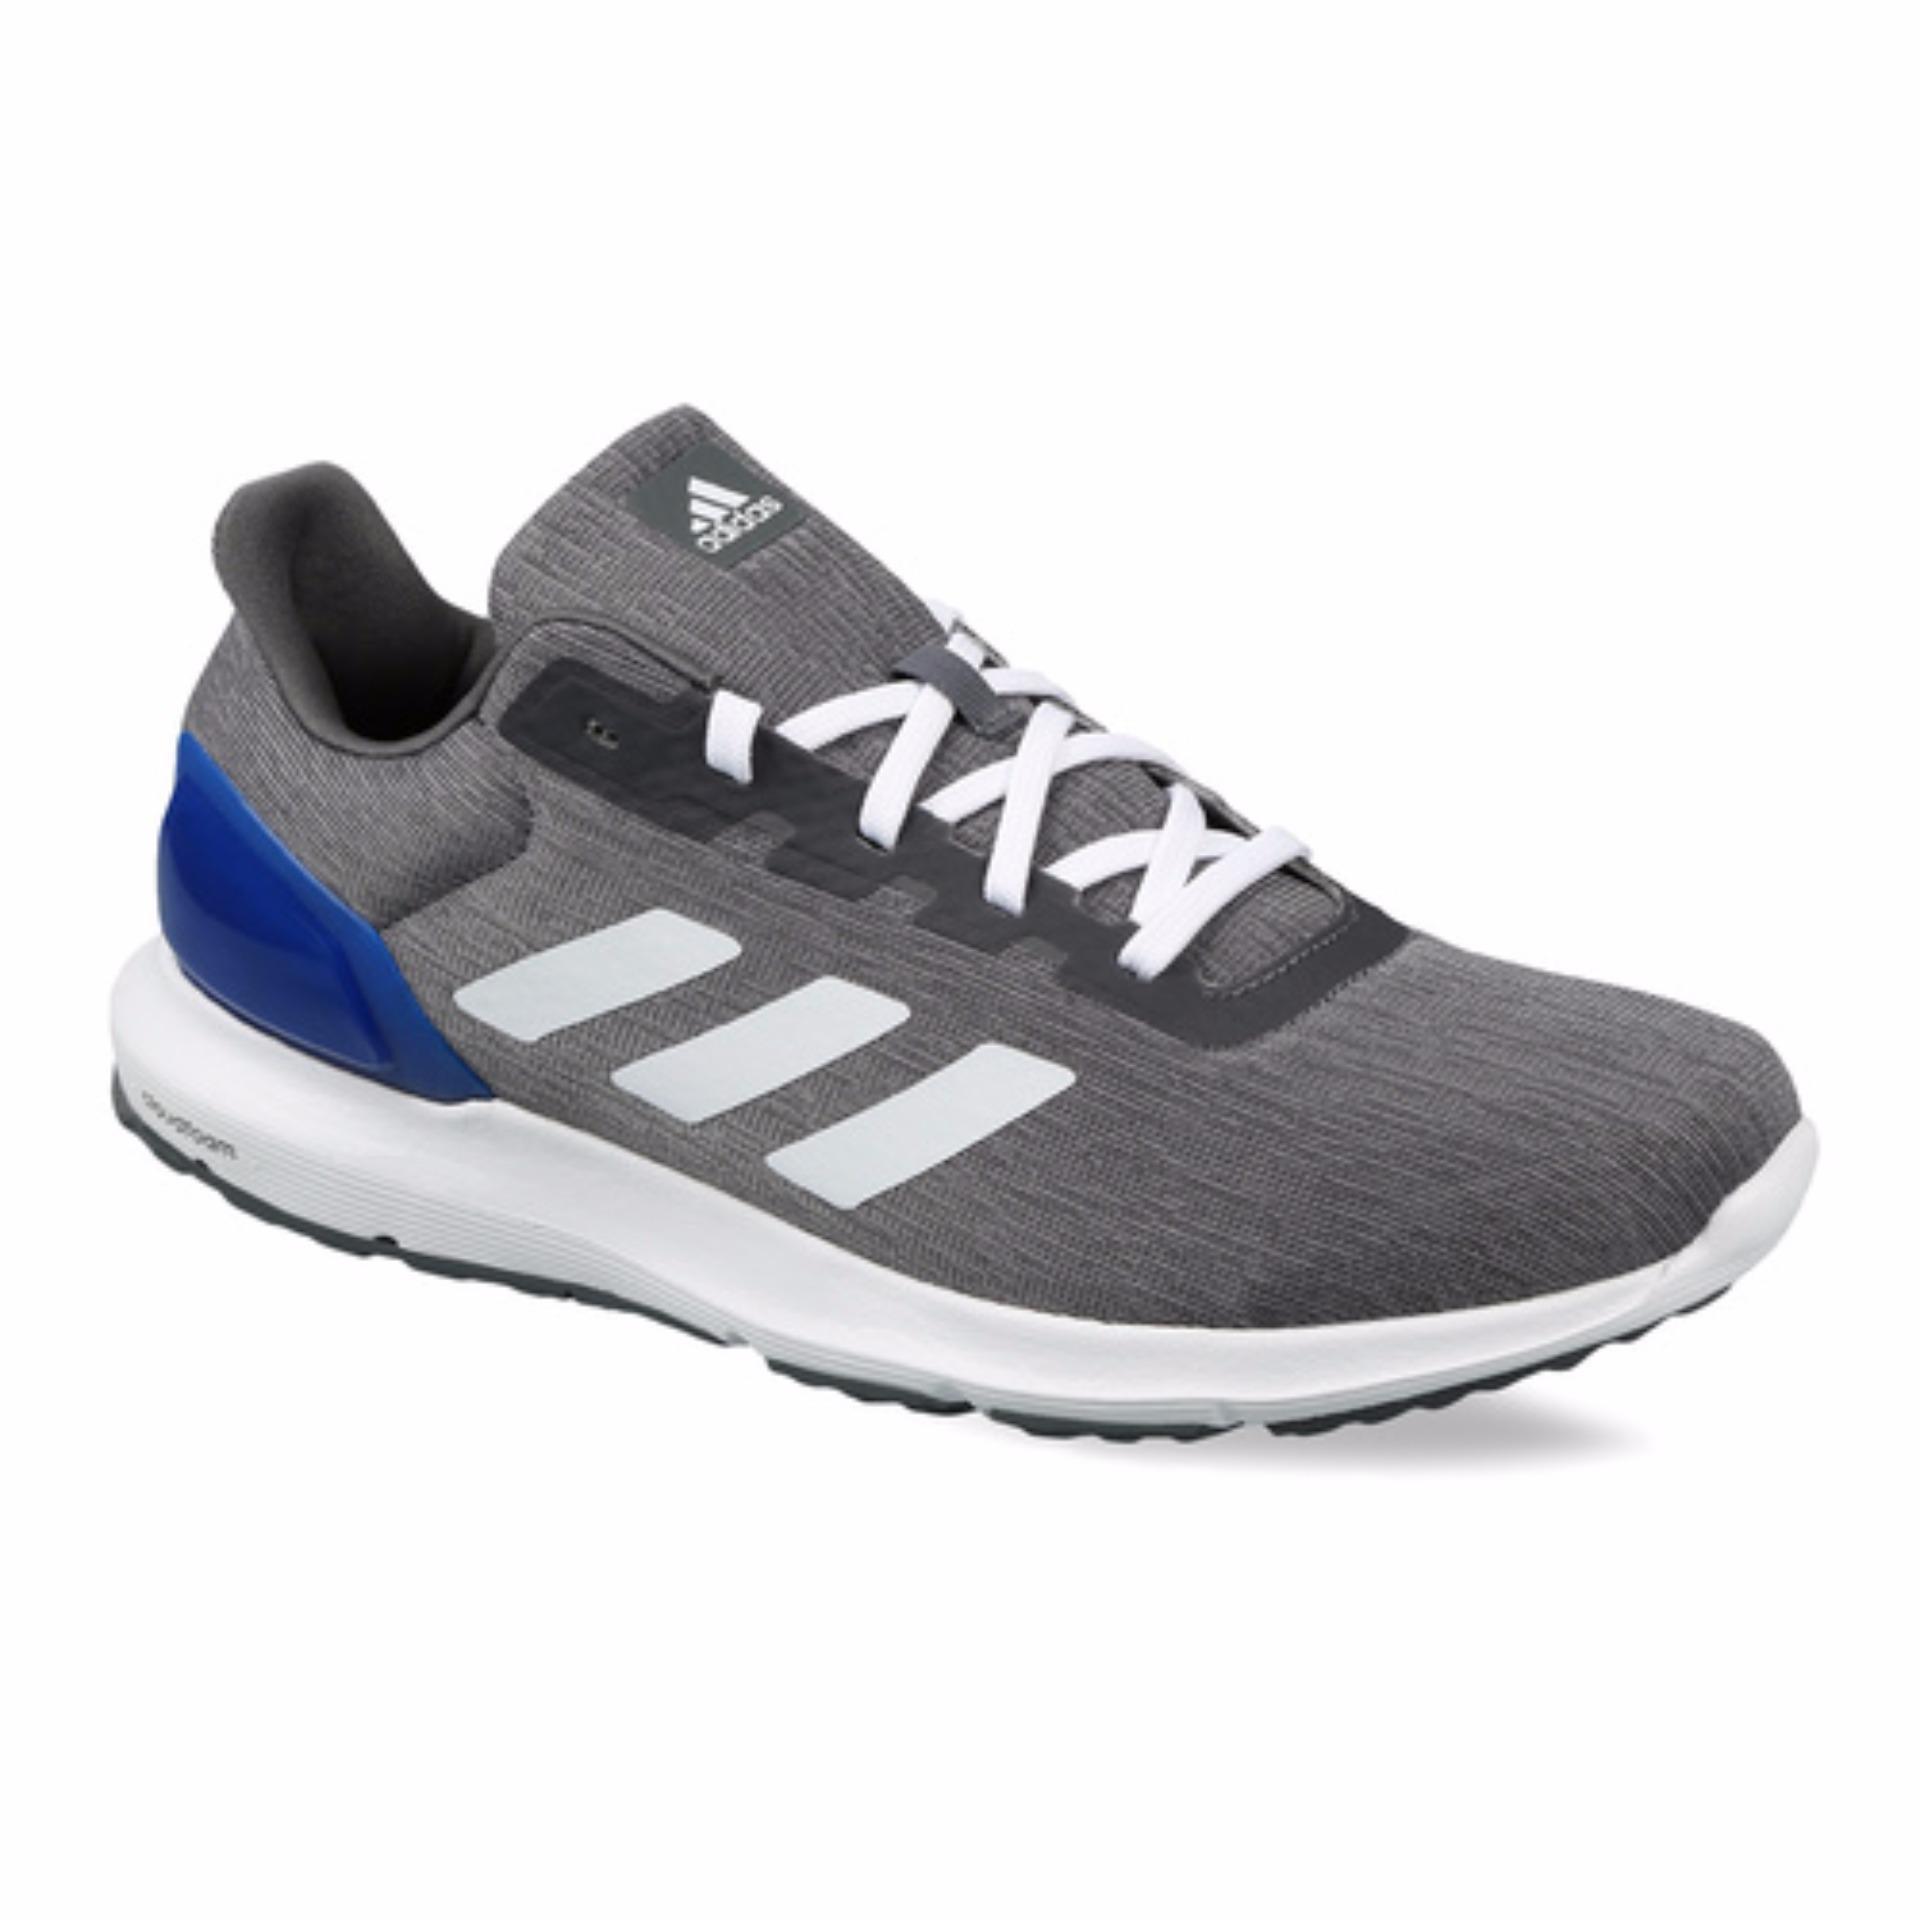 Beli Adidas Sepatu Running Cosmic 2 M Bb3585 Secara Angsuran